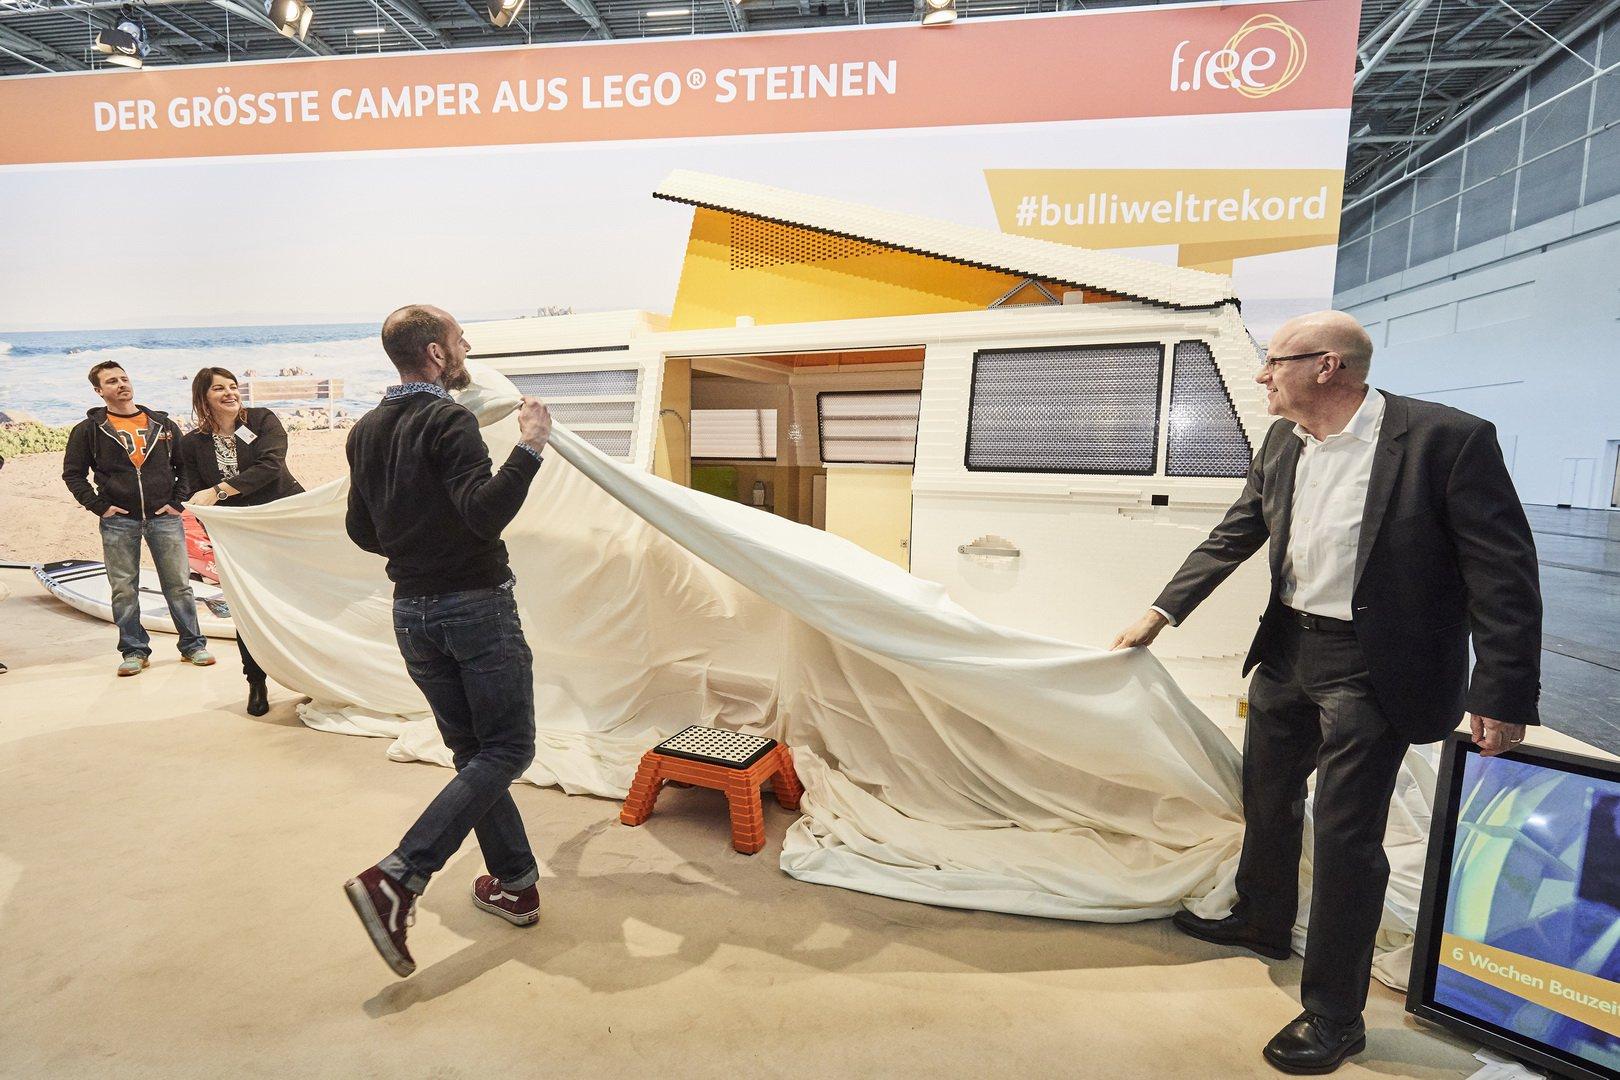 Volkswagen T2 Bulli Lego (8)